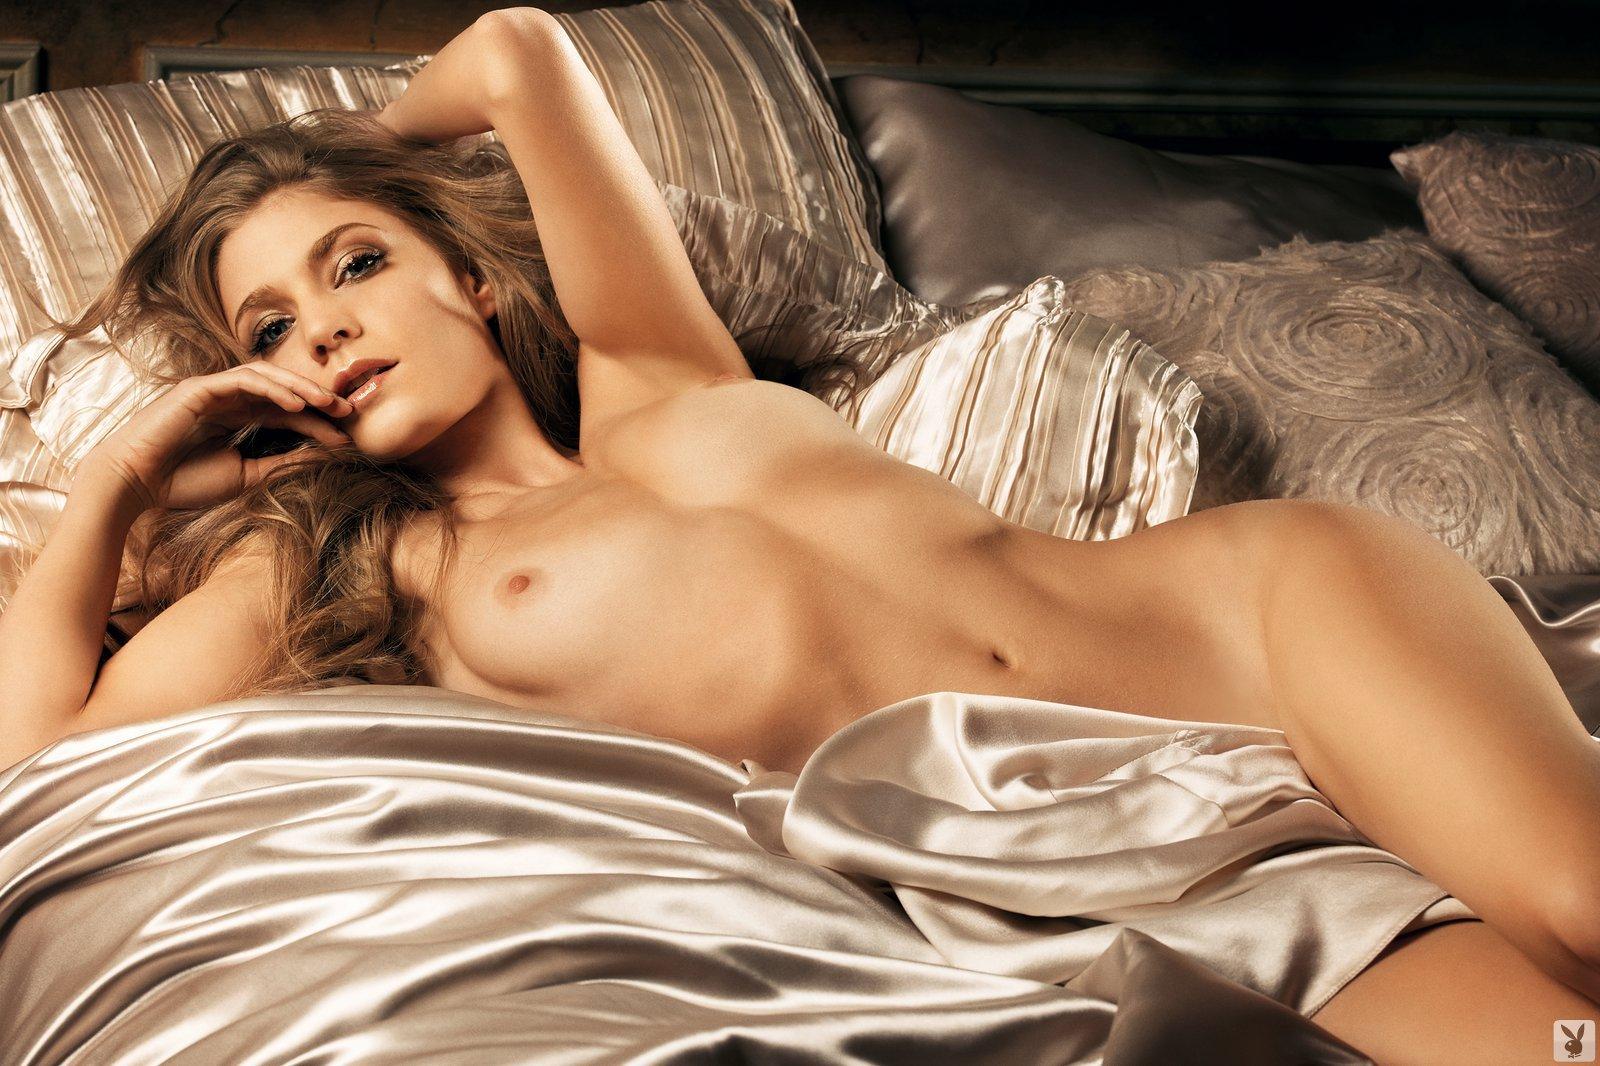 Winter Ave Zoli, Nude On Playboy Plus (16)